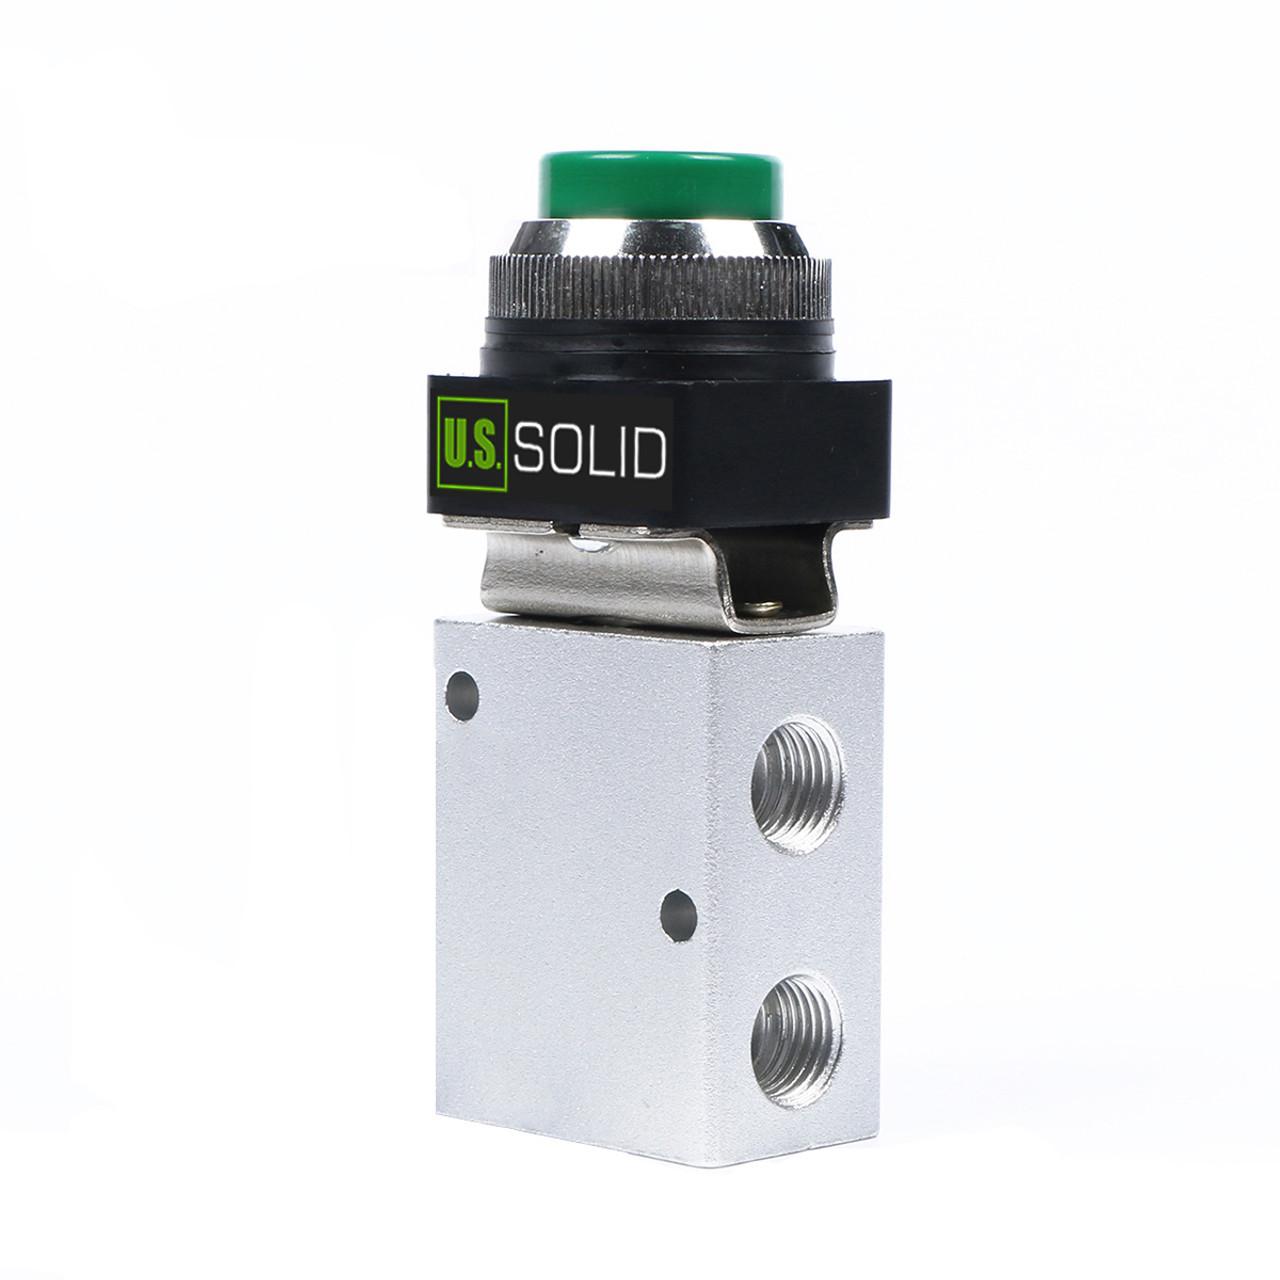 "U.S. Solid 1/4"" NPT Green Push Button 3 Way, 2 Position Pneumatic Control Mechanical Valve"